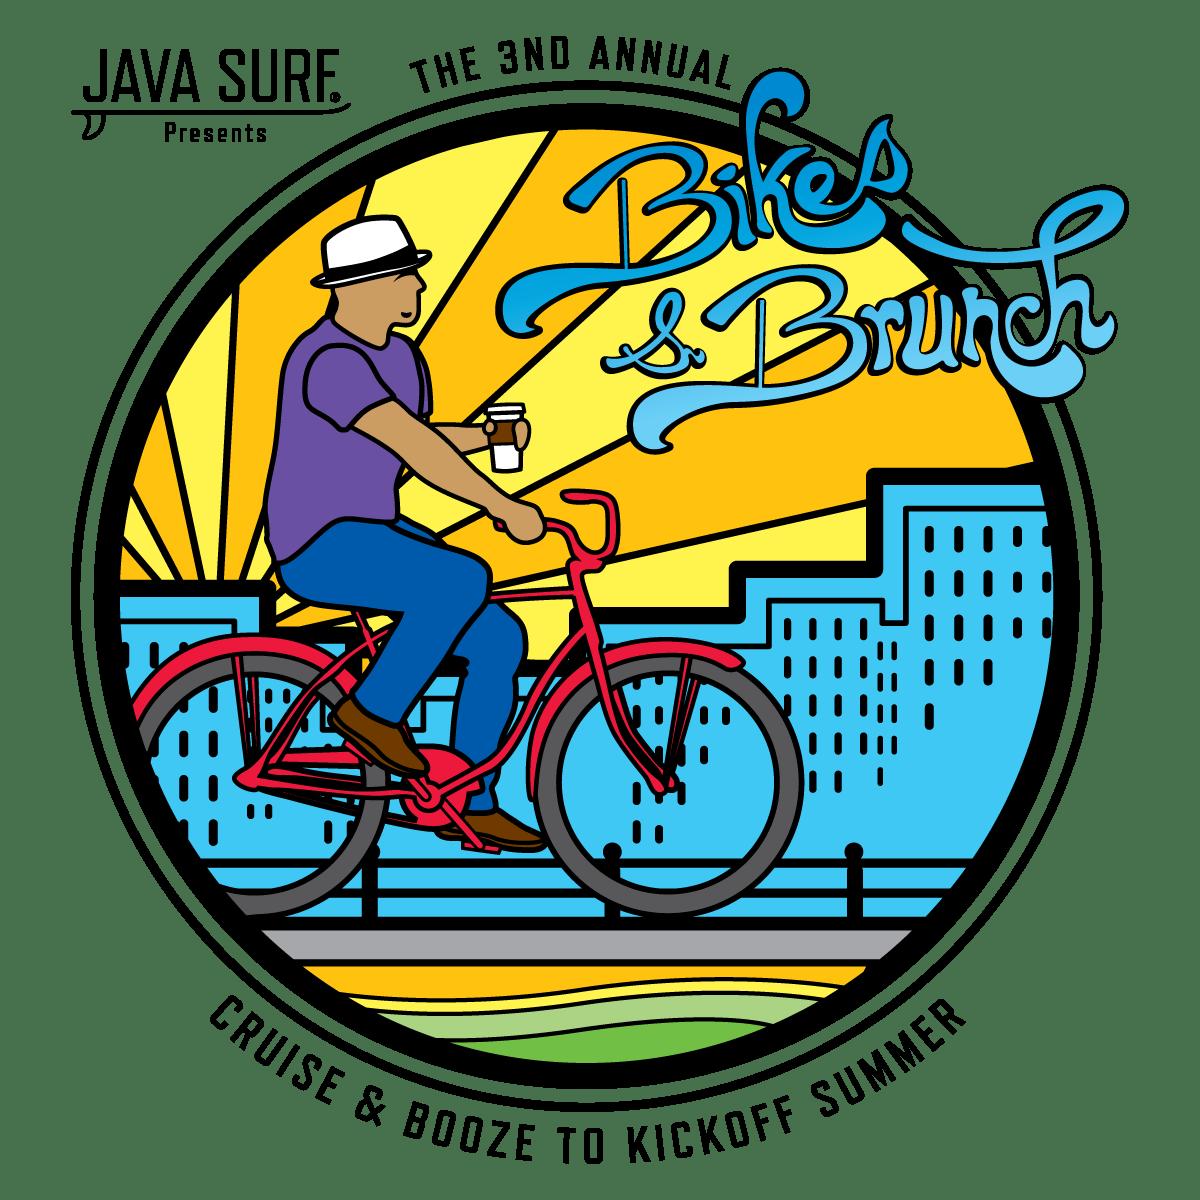 bikes brunch event virginia beach